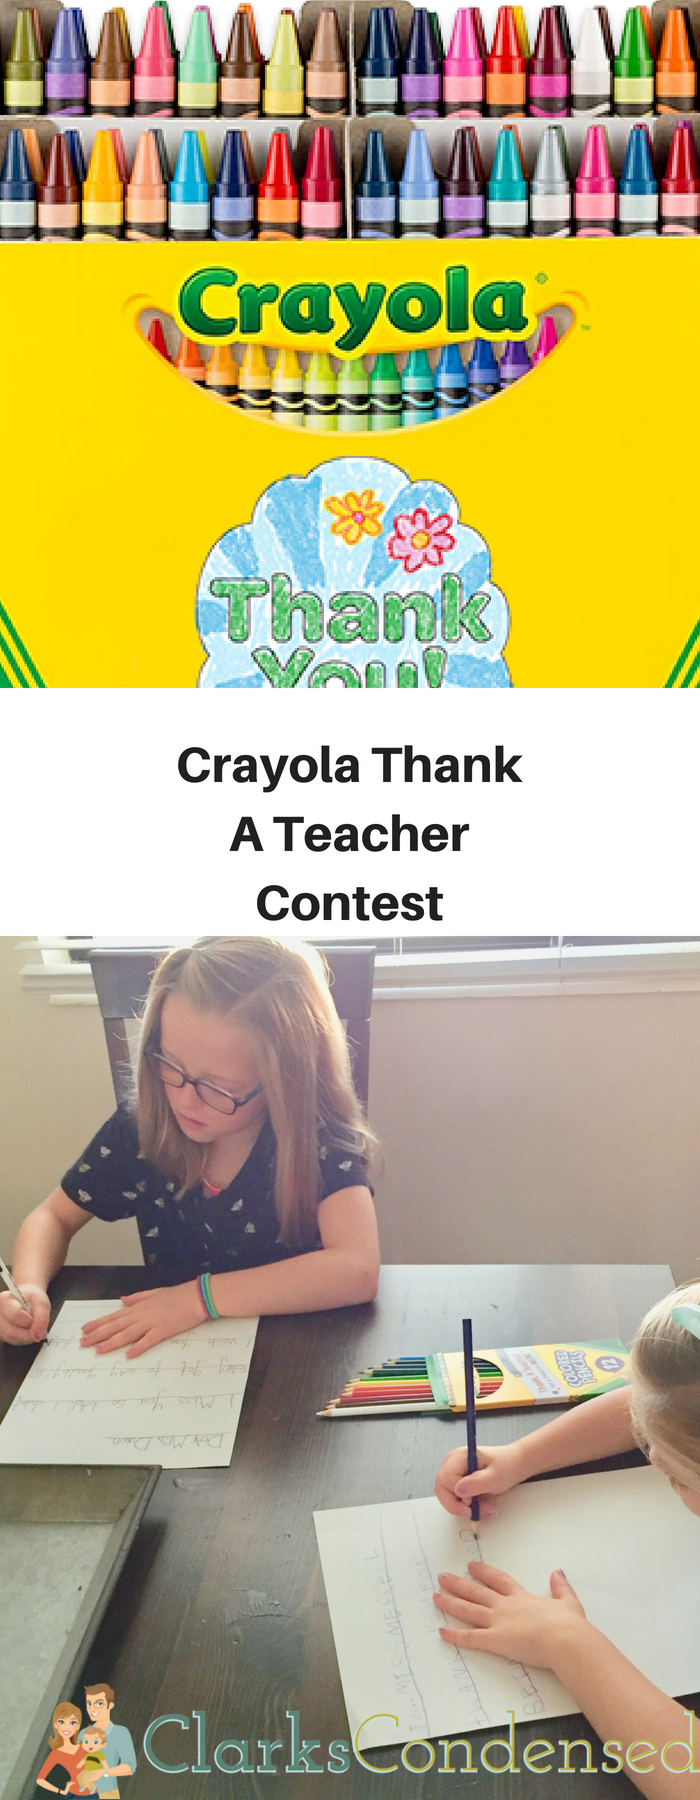 Be sure to enter the Crayola Thank A Teacher contest! #CrayolaThanks, #IC, and #CrayolaPartner via @clarkscondensed